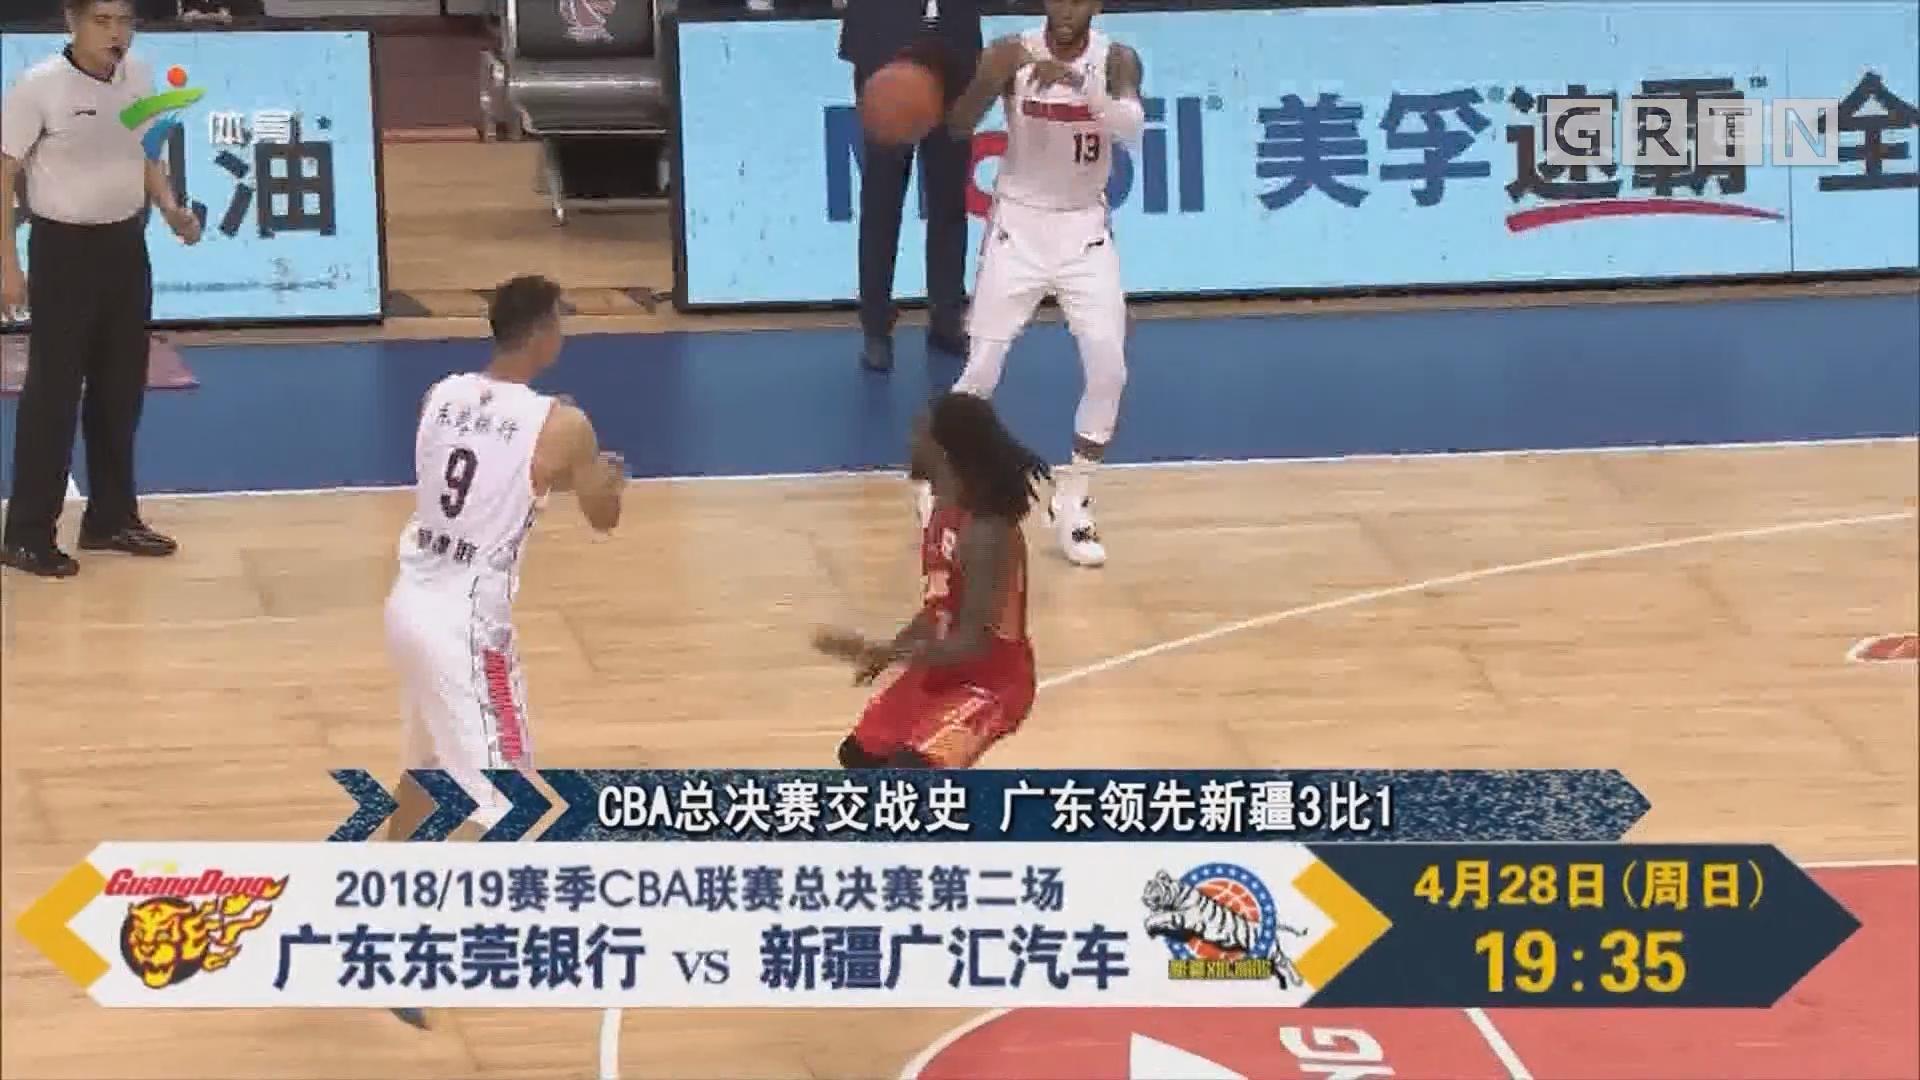 CBA总决赛交战史 广东领先新疆3比1